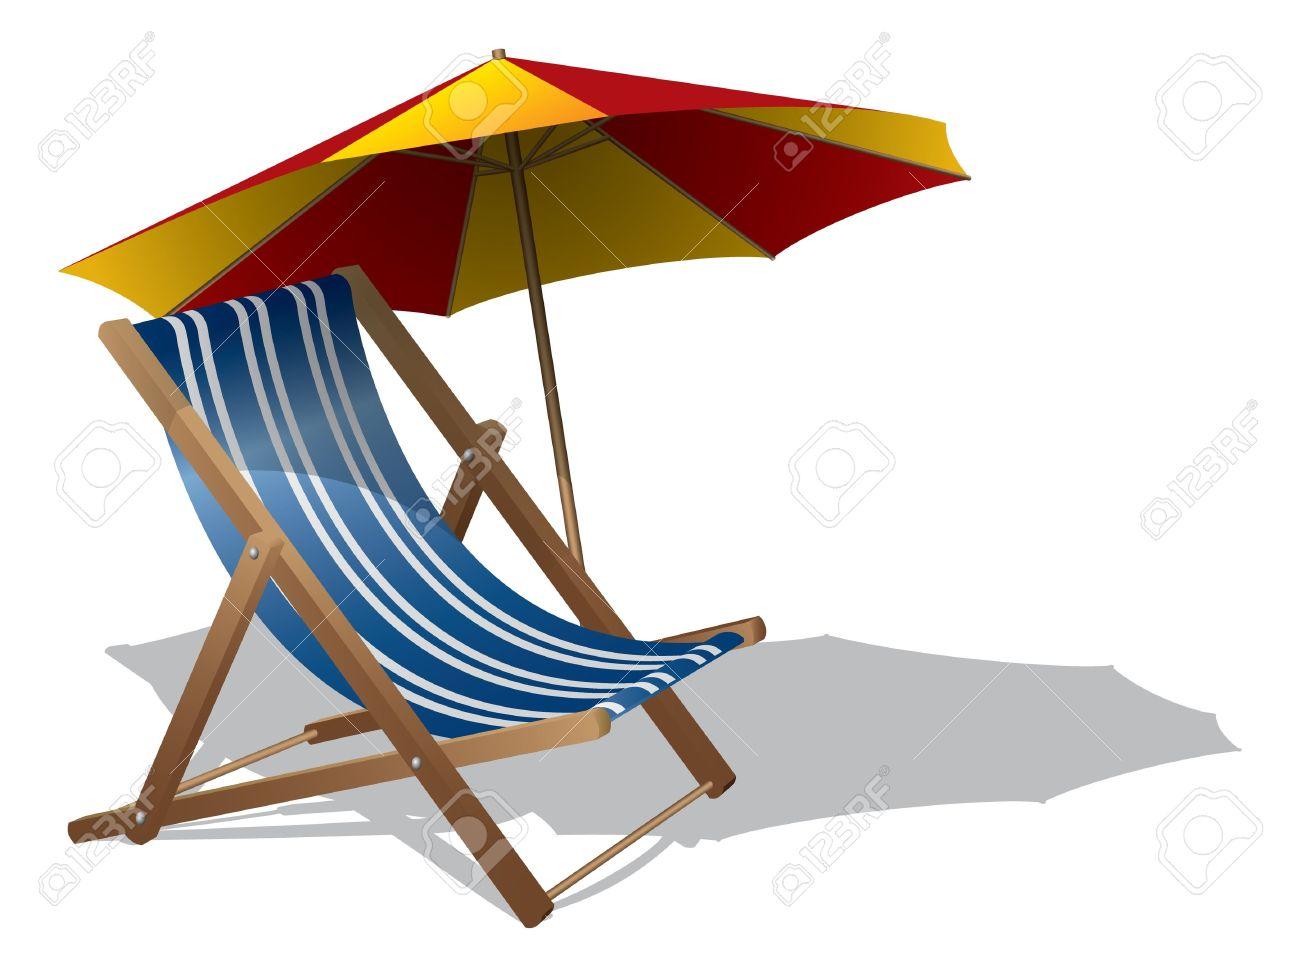 Strandkorb gezeichnet  Strandkorb Clipart | tentfox.com